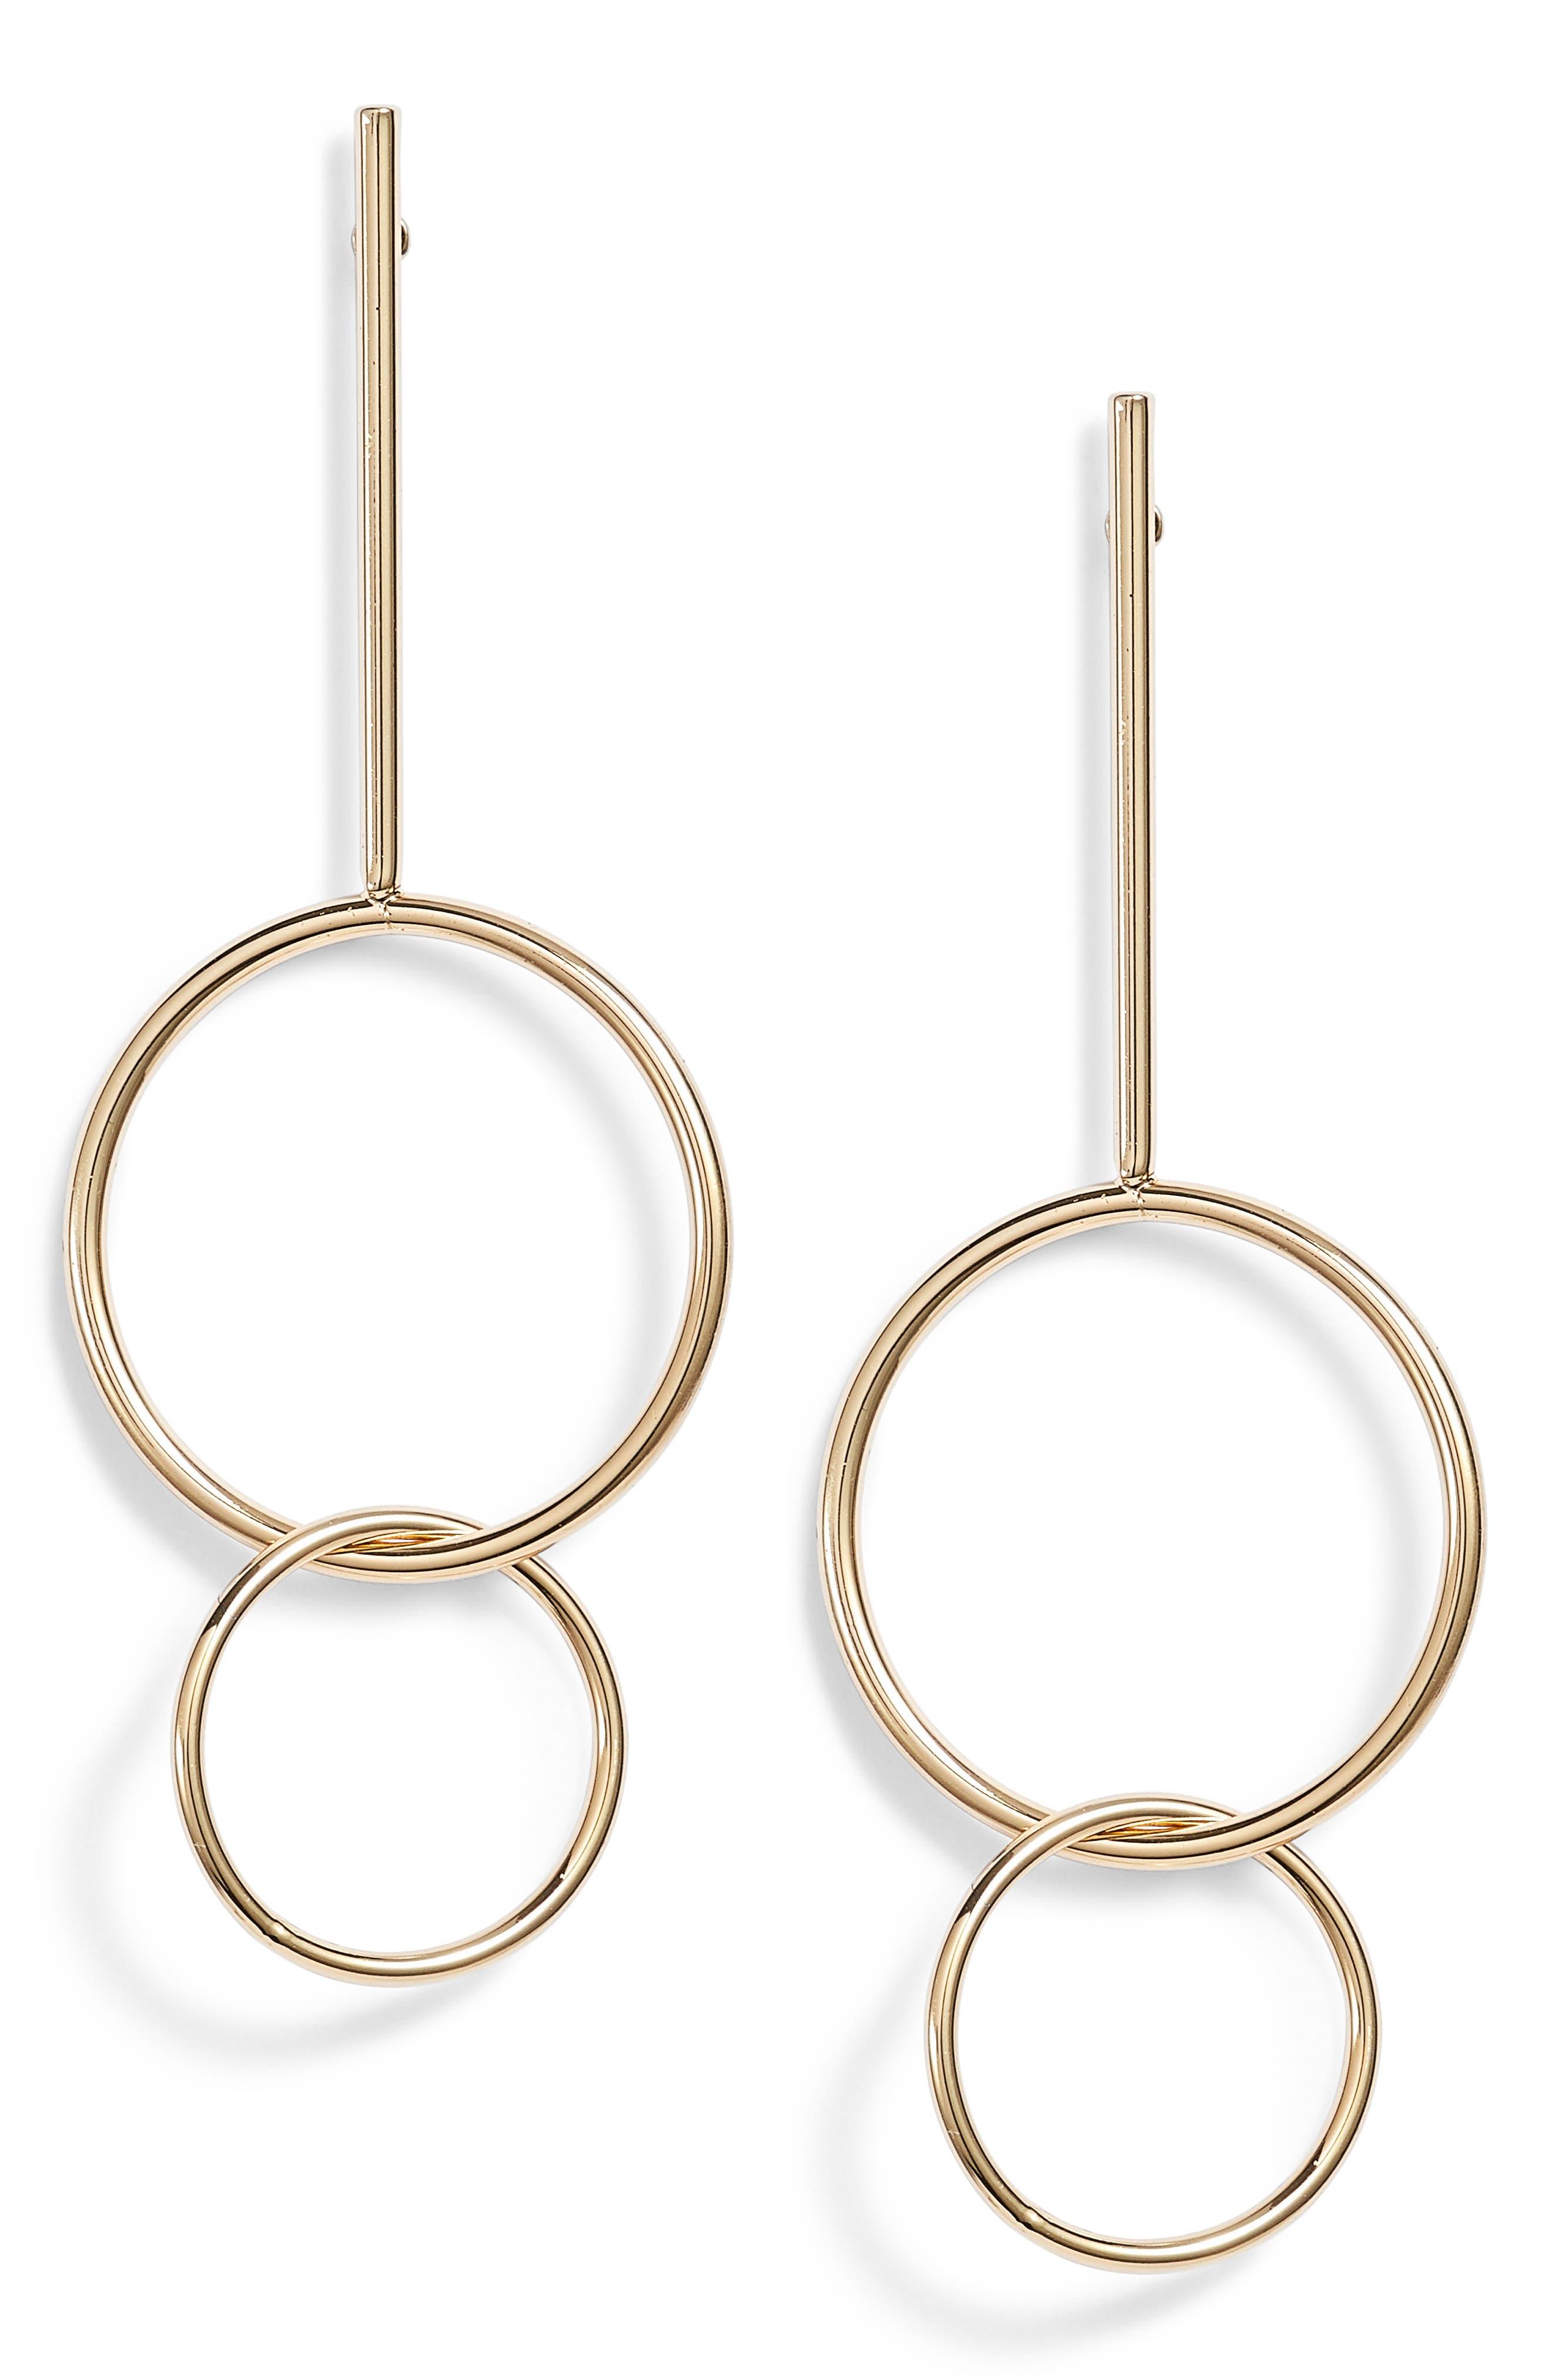 Orbit Ring Linear Earrings,                             Main thumbnail 1, color,                             Gold